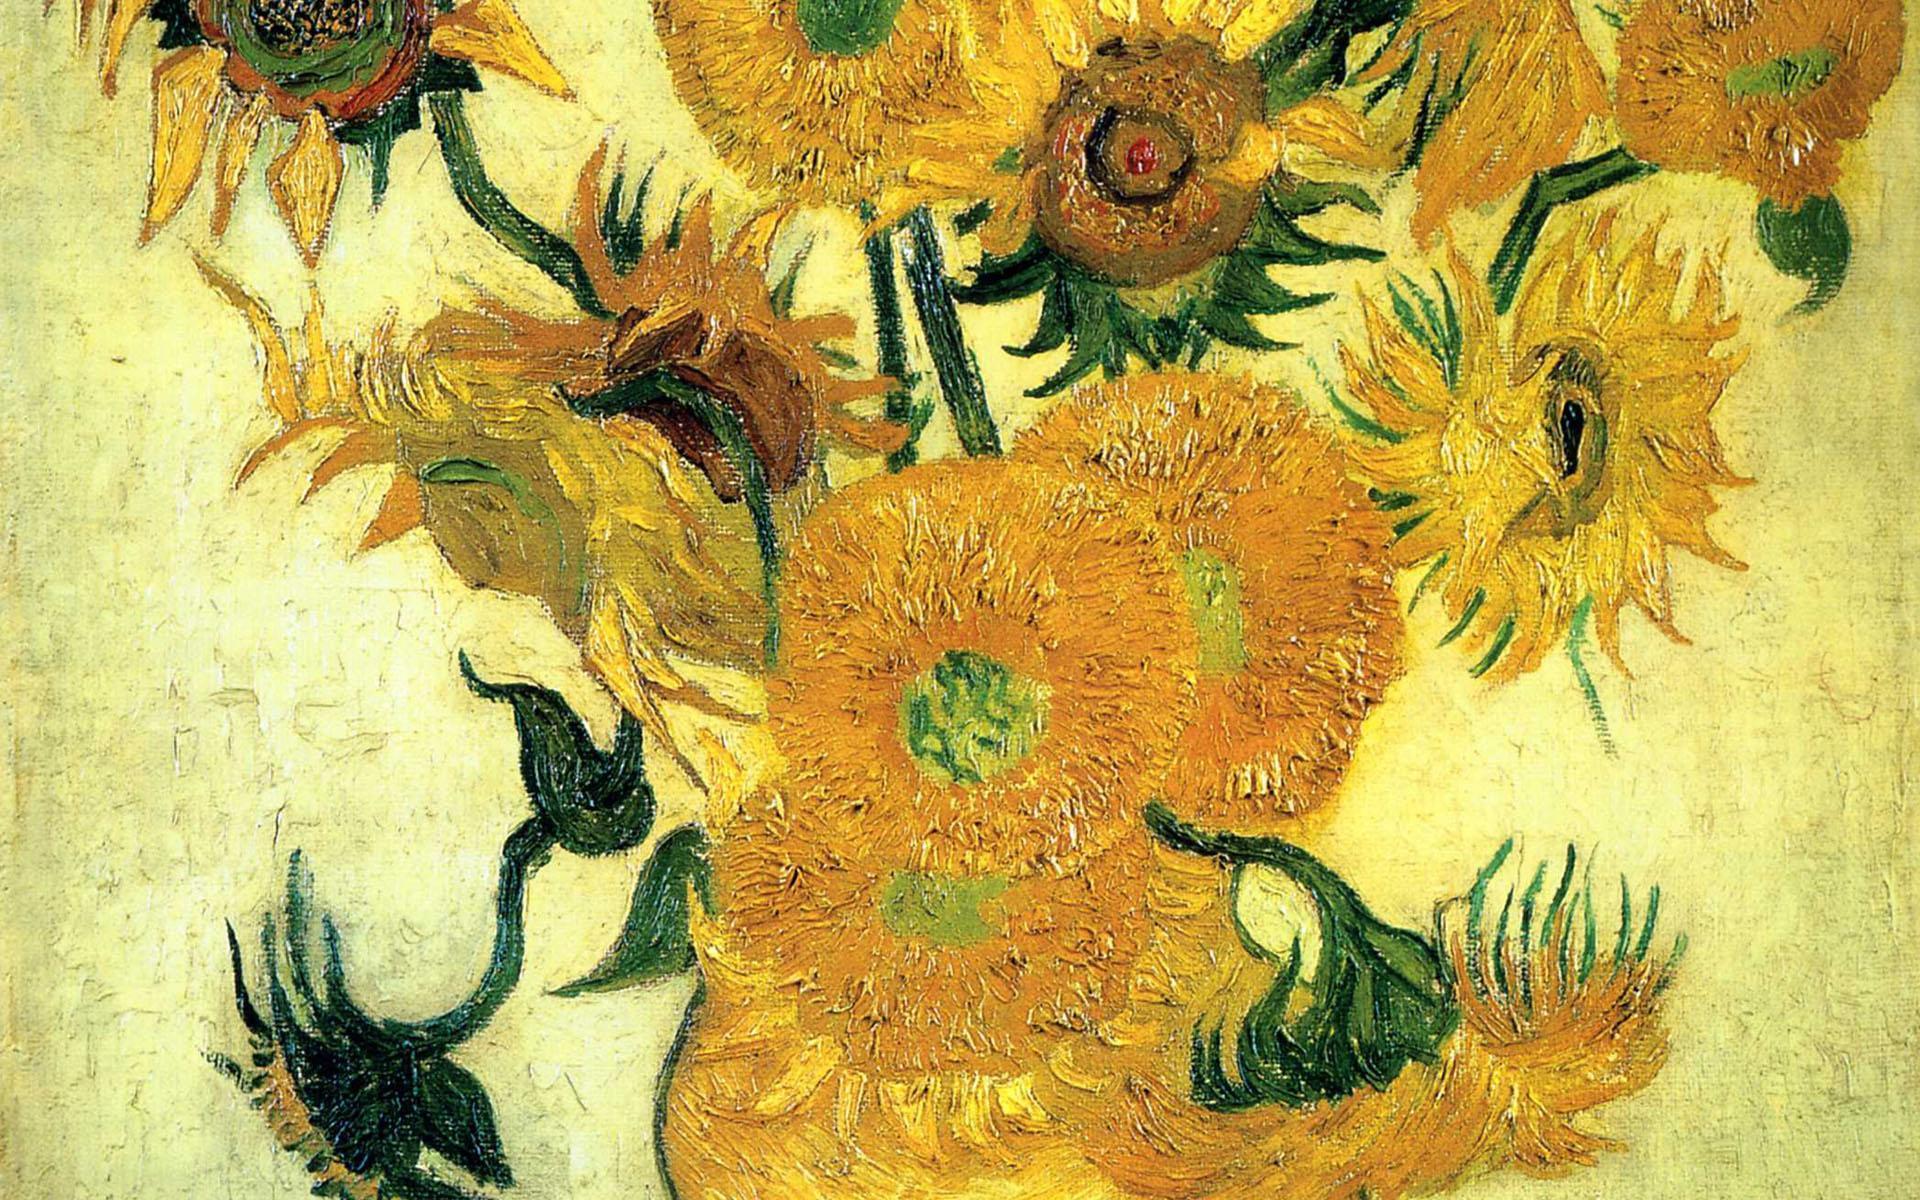 Van Gogh High Resolution Wallpapers Top Free Van Gogh High